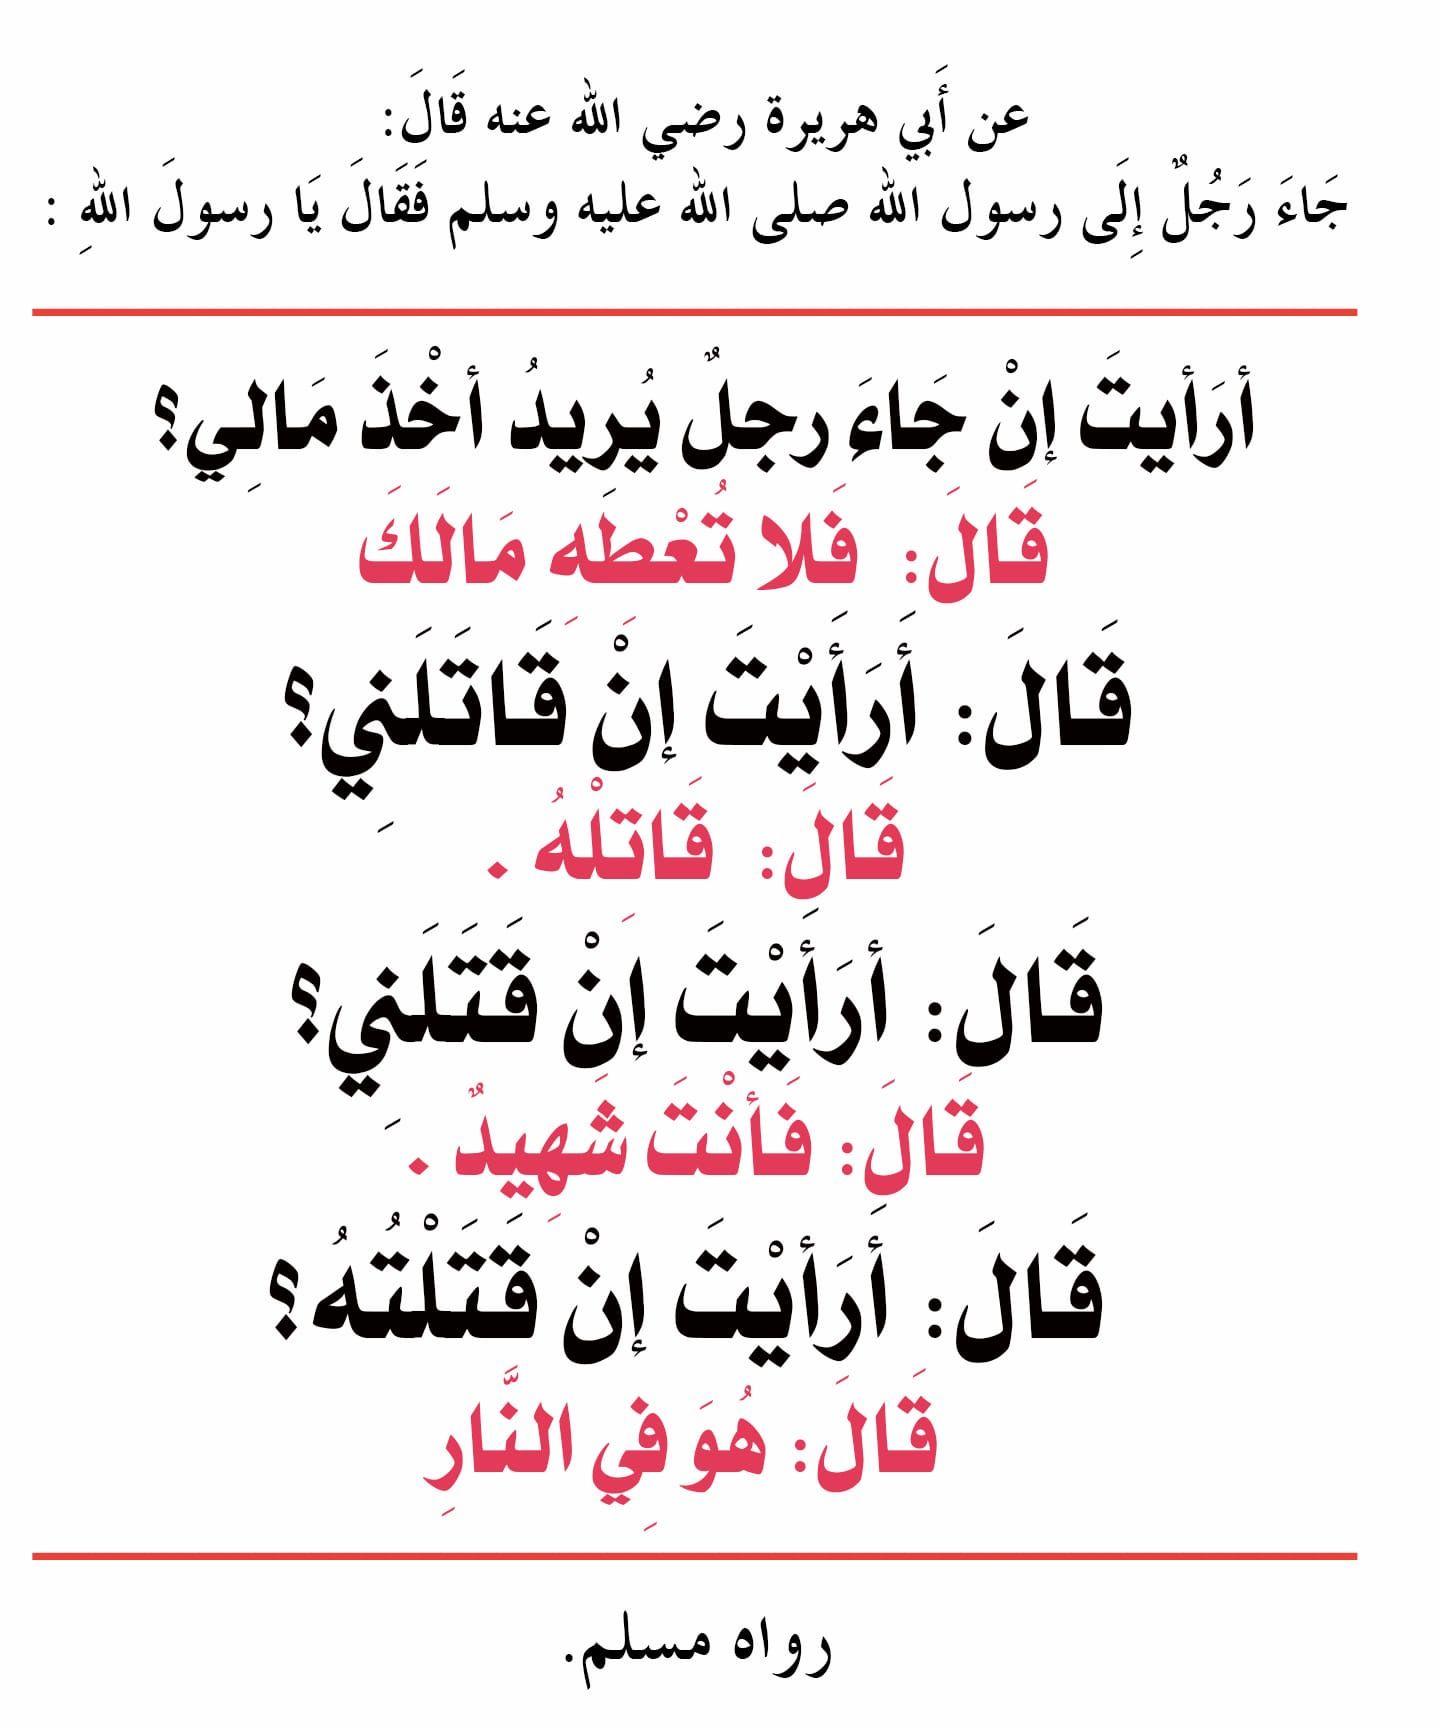 Pin By The Noble Quran On I Love Allah Quran Islam The Prophet Miracles Hadith Heaven Prophets Faith Prayer Dua حكم وعبر احاديث الله اسلام قرآن دعاء Islamic Quotes Islam Facts Quotes